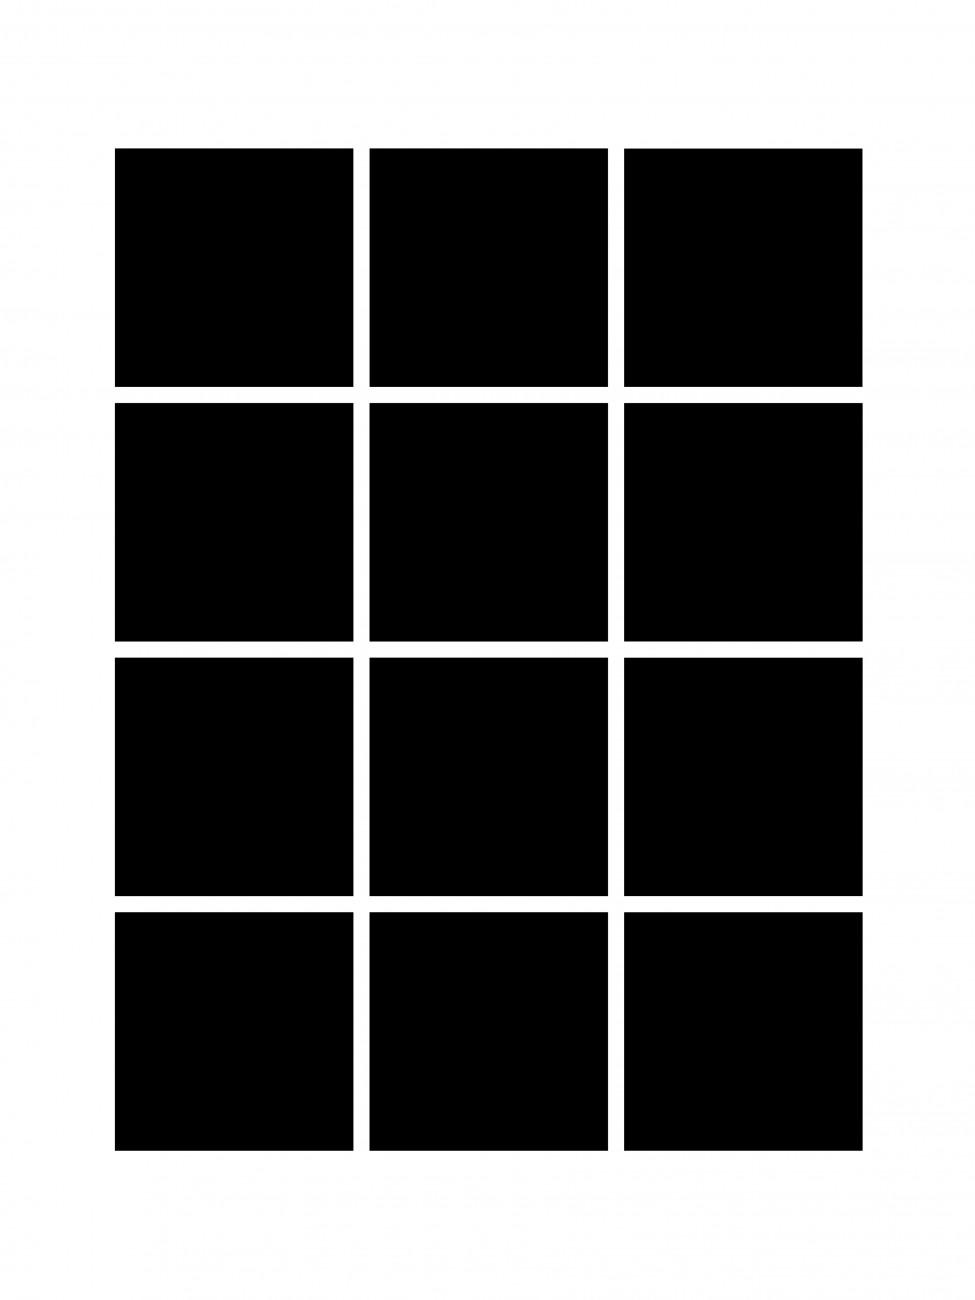 30x40 cm 03 - 12 bilder